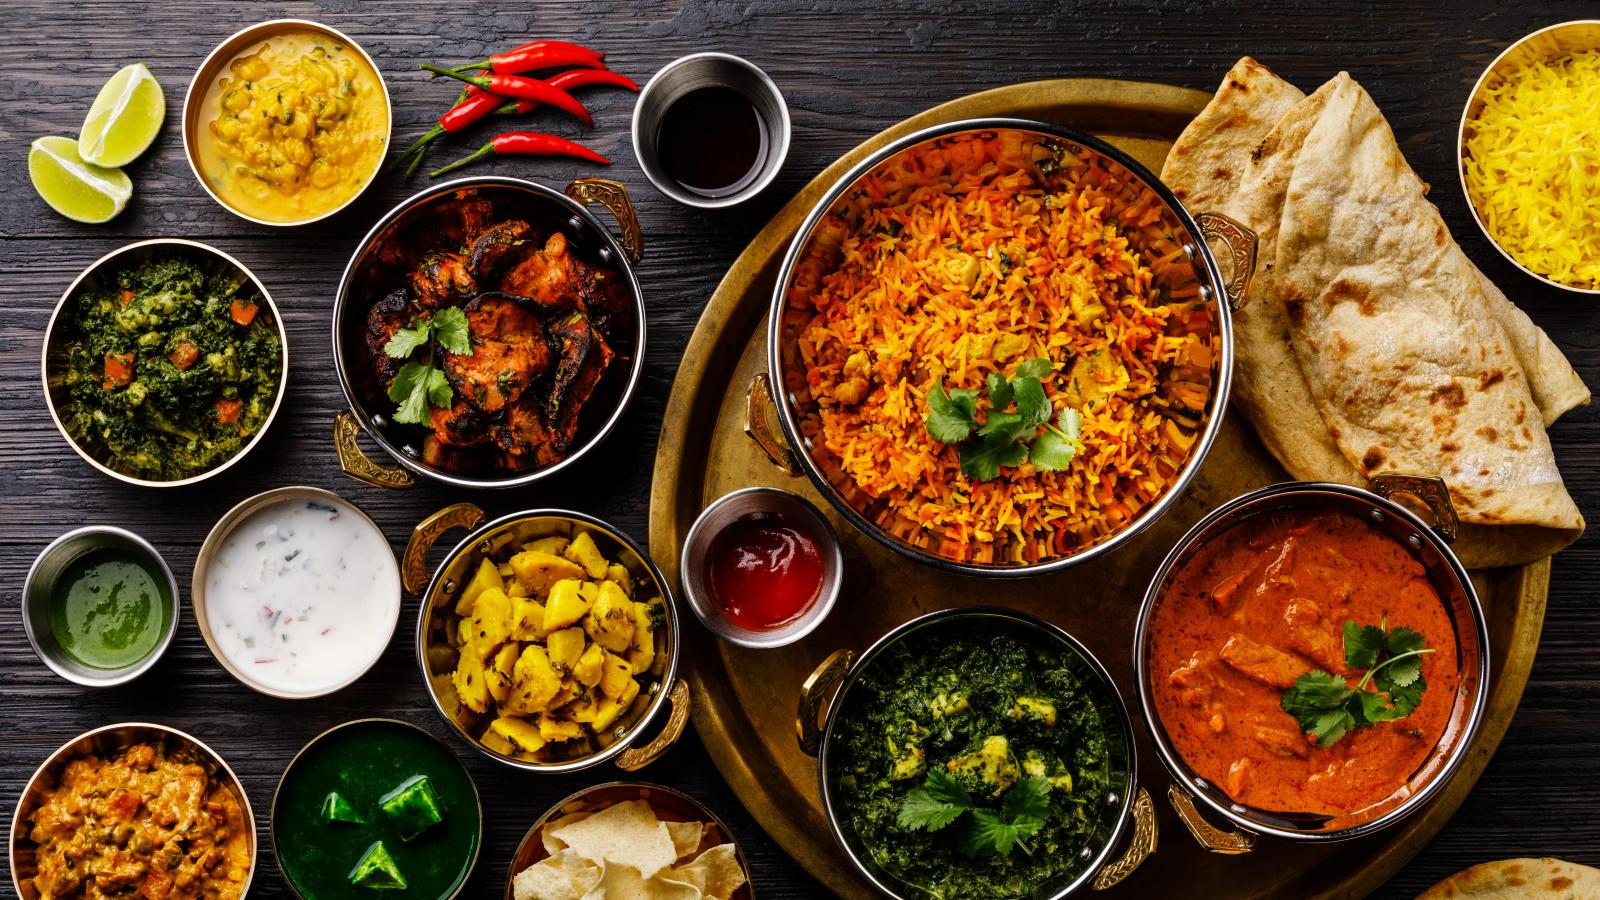 Top 5 Indian restaurantsin Qatar